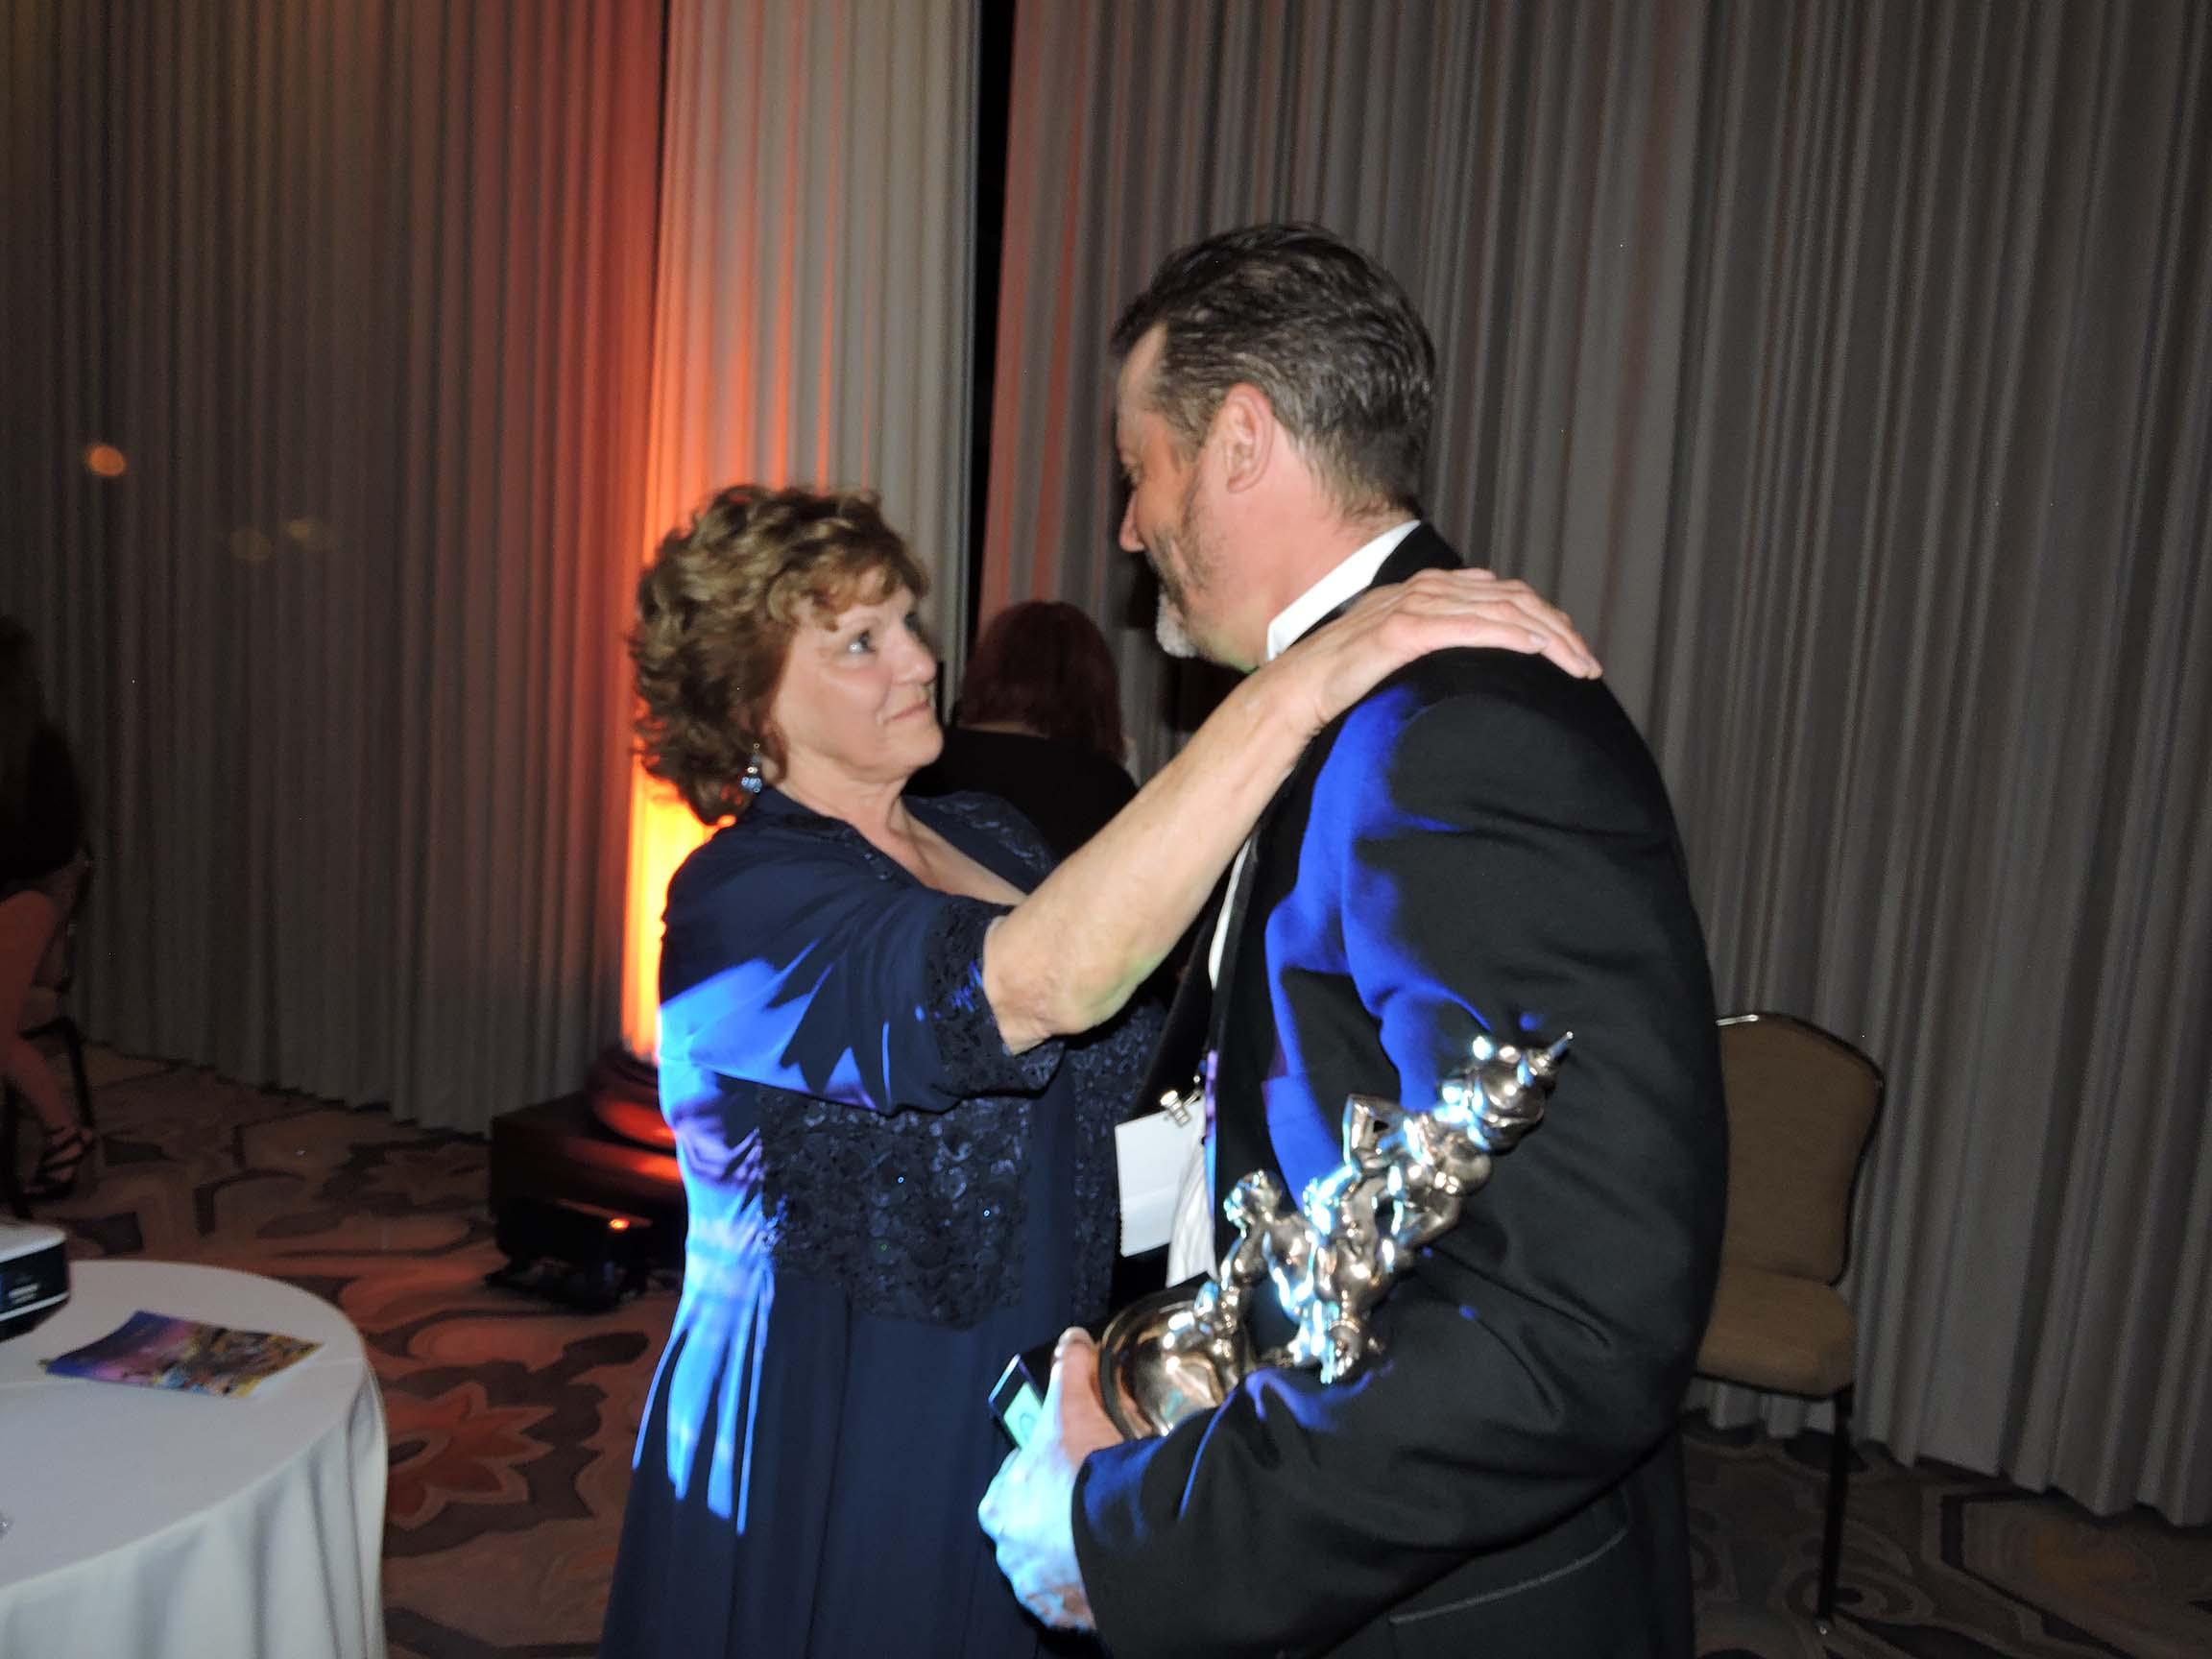 Betty Evans congratulates Stephan Pastis...